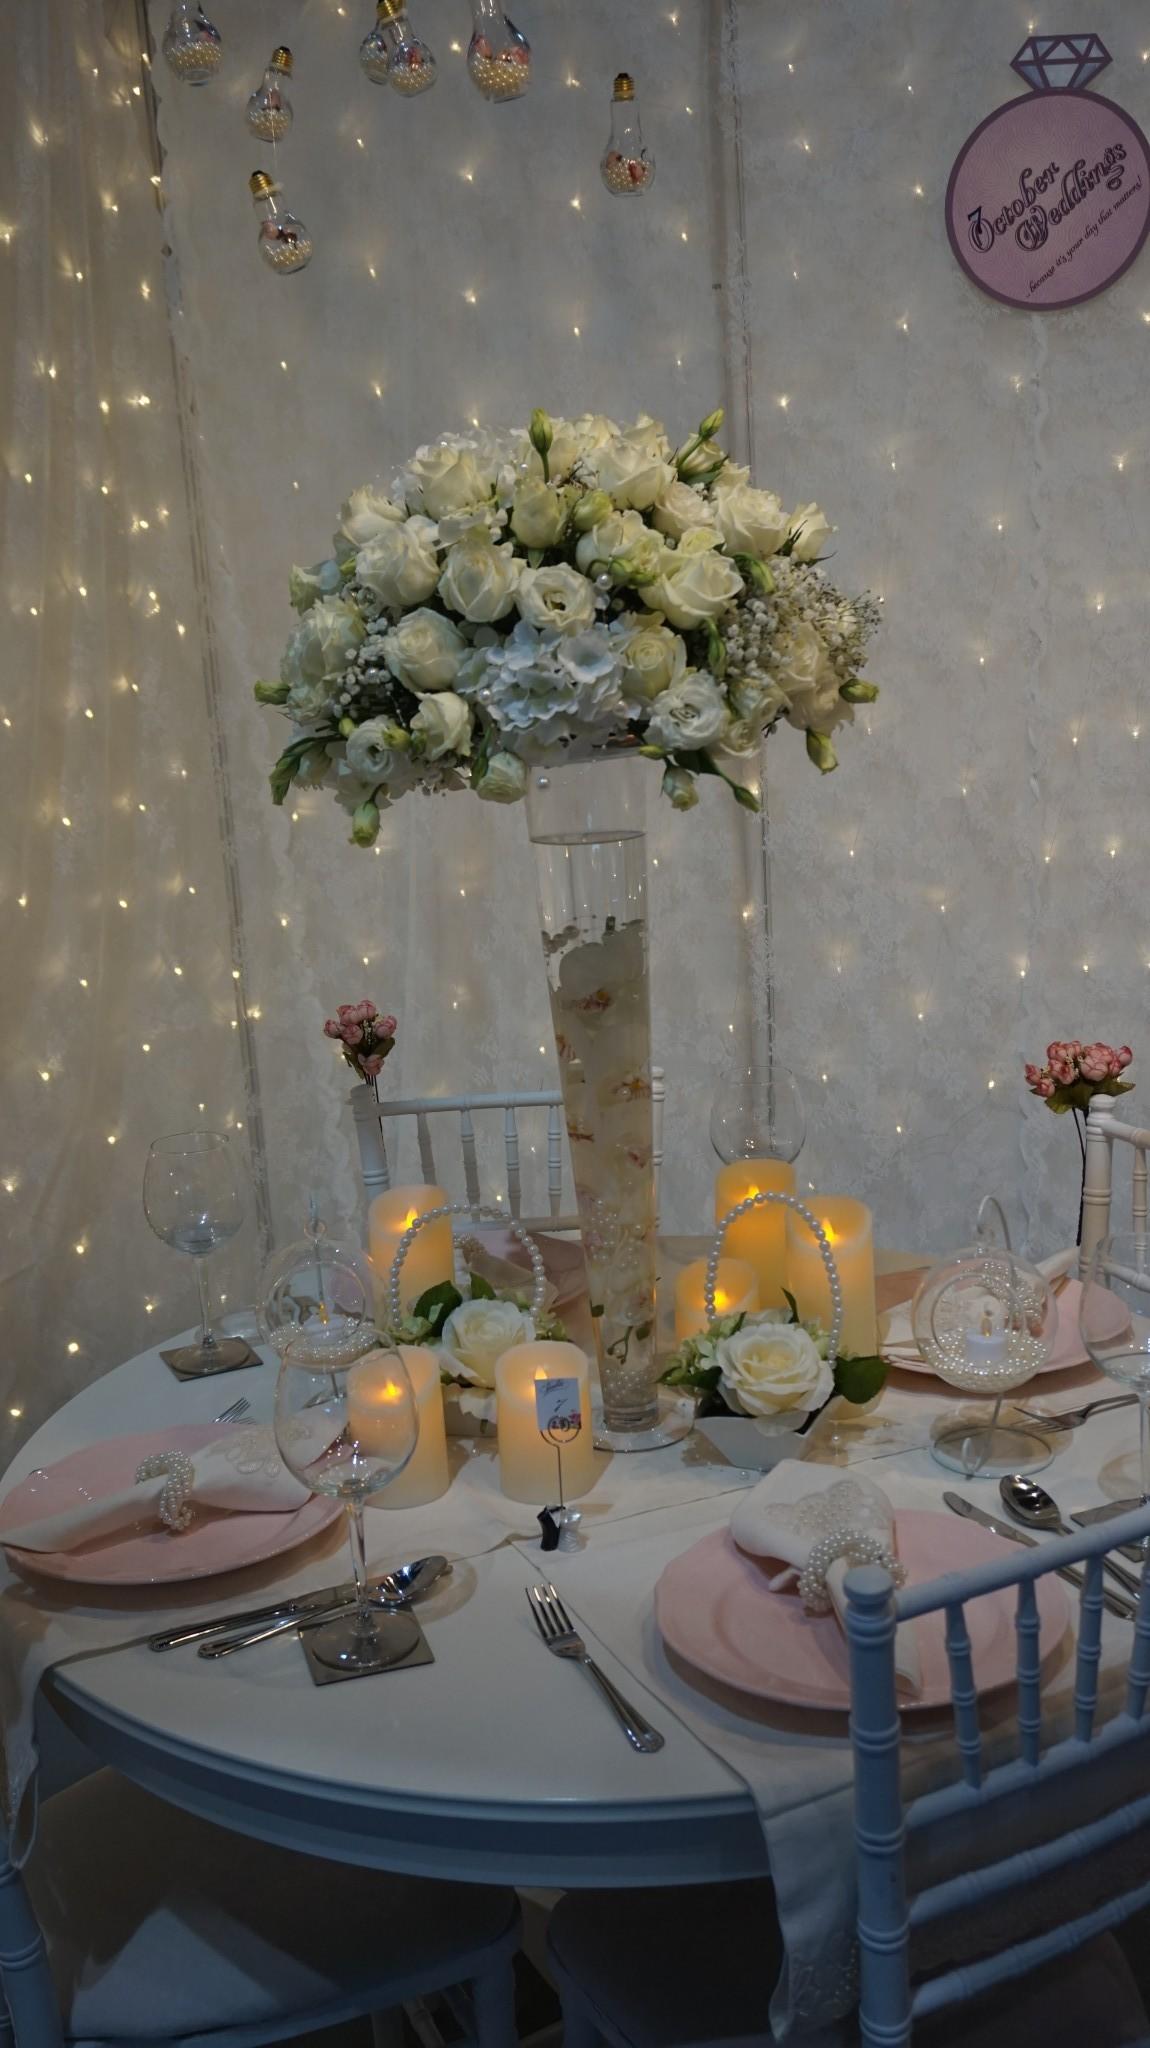 7 October Weddings